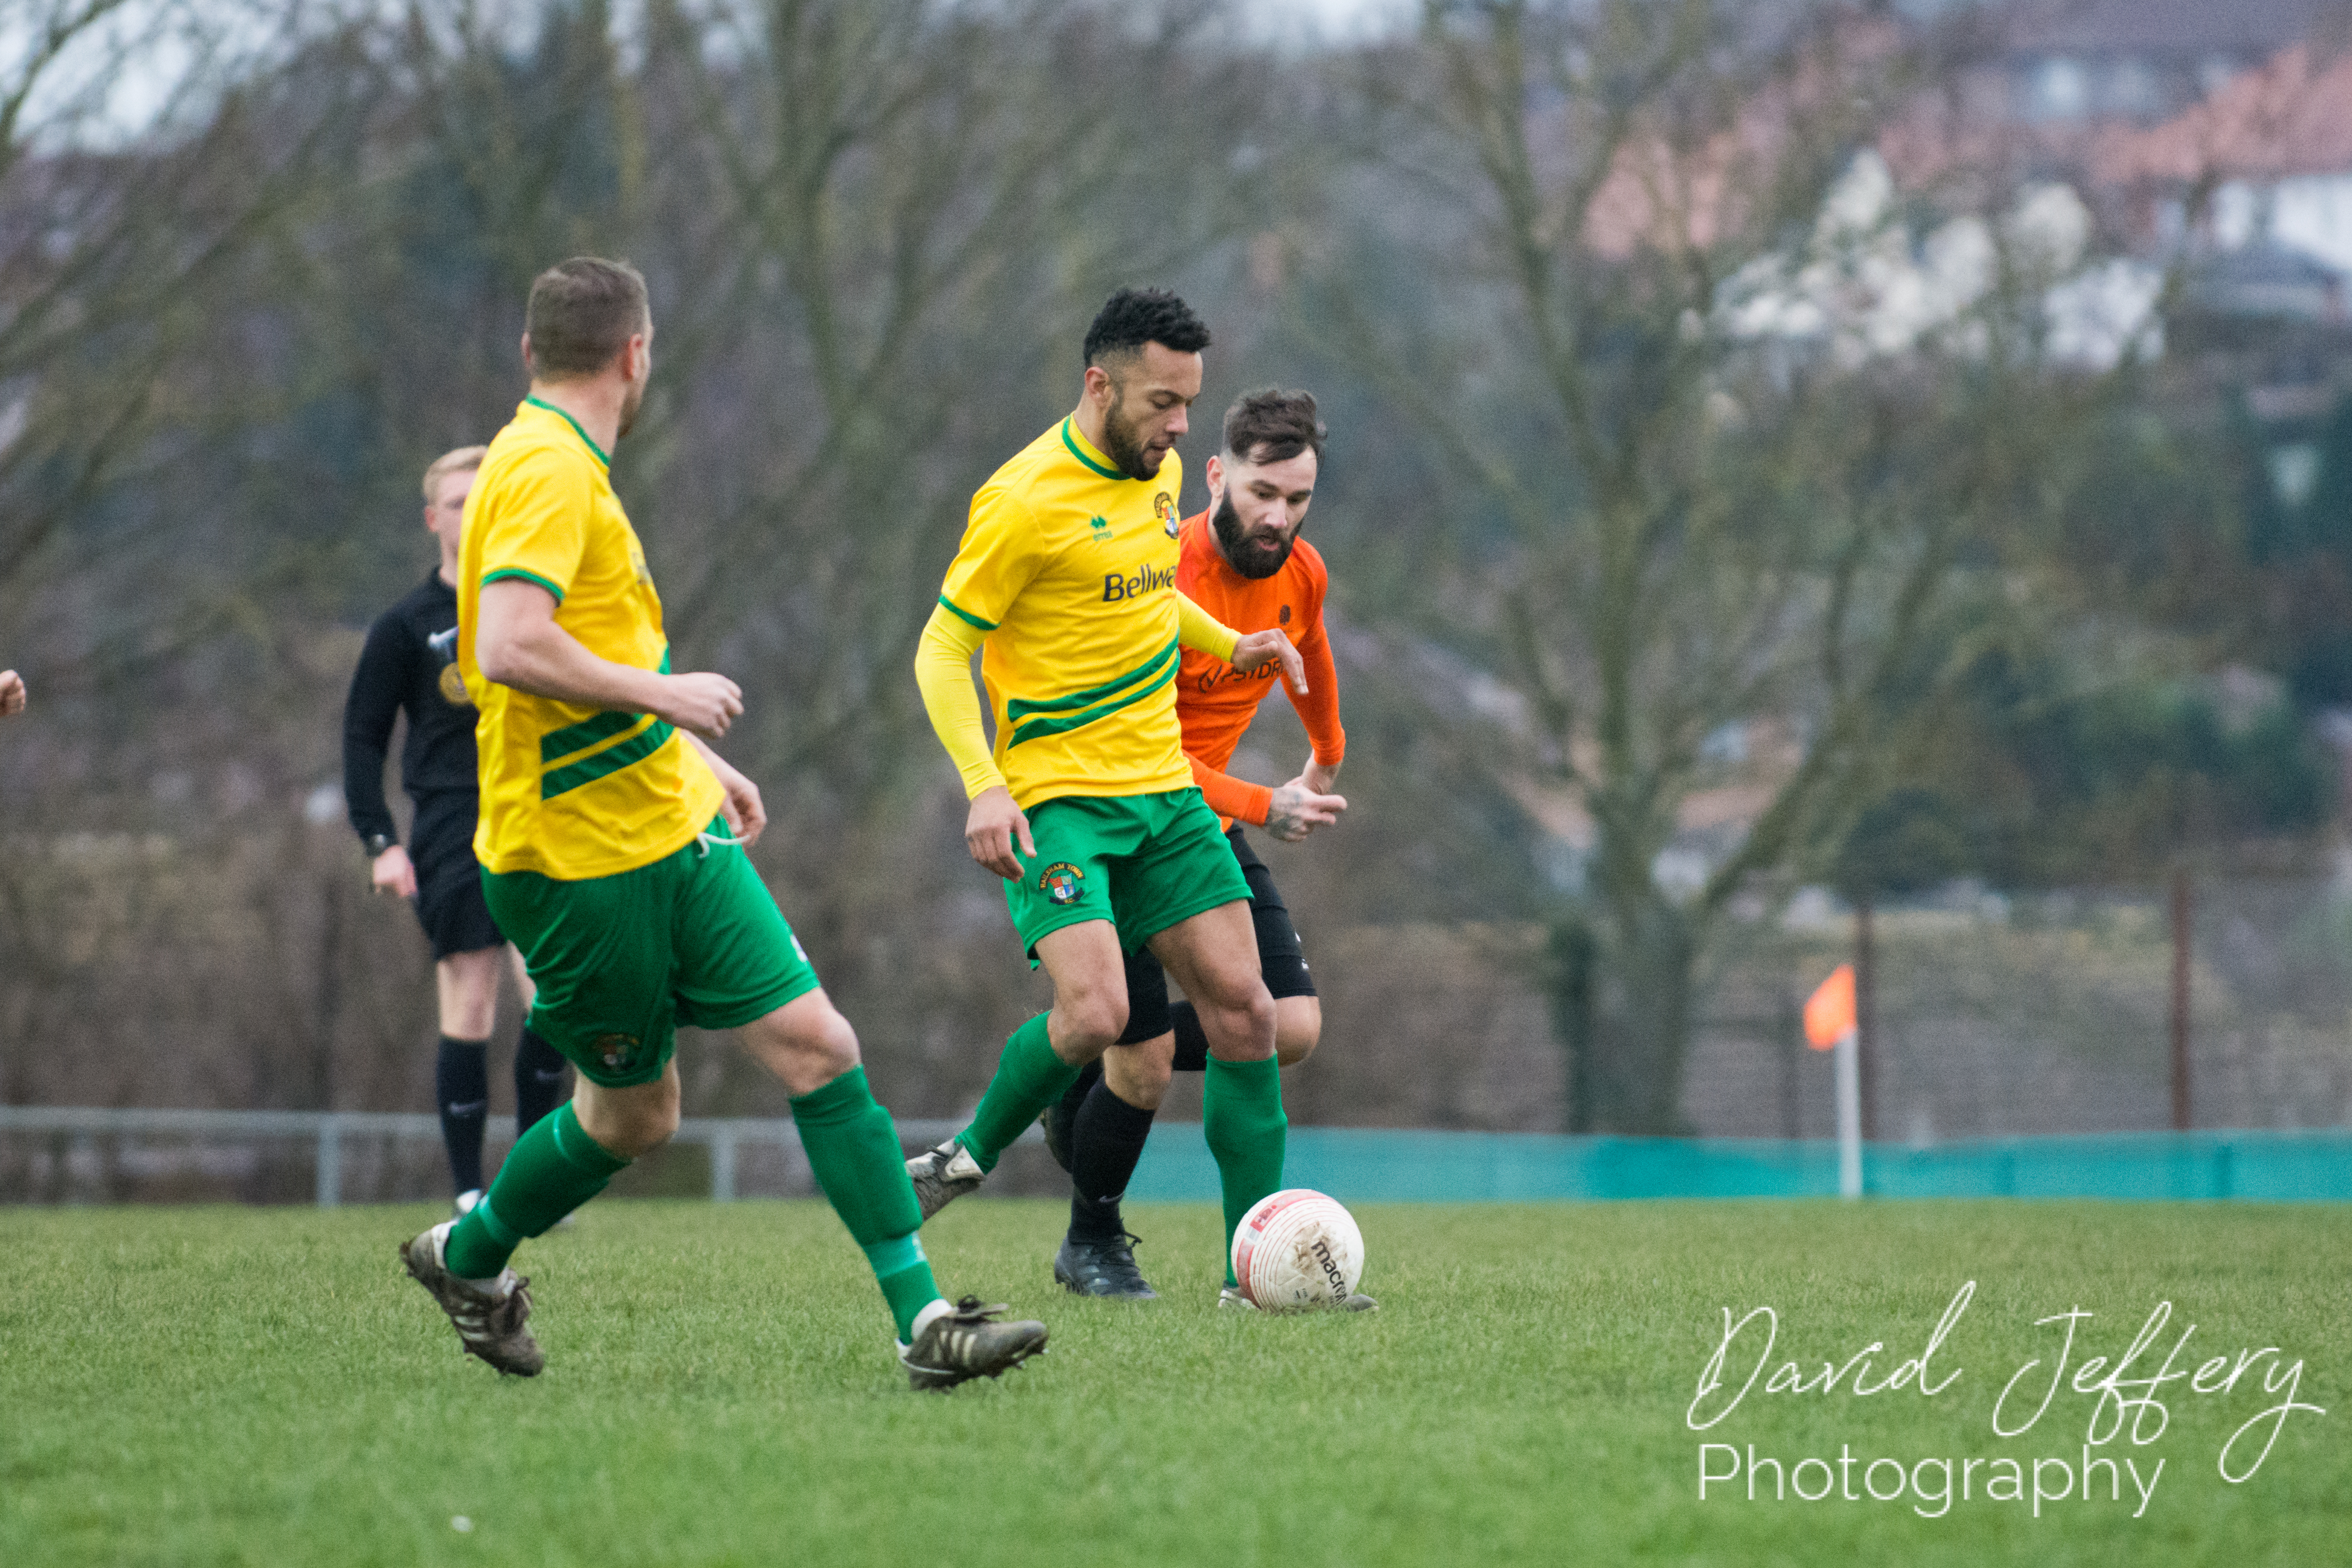 MOFC vs Hlsham 05.01